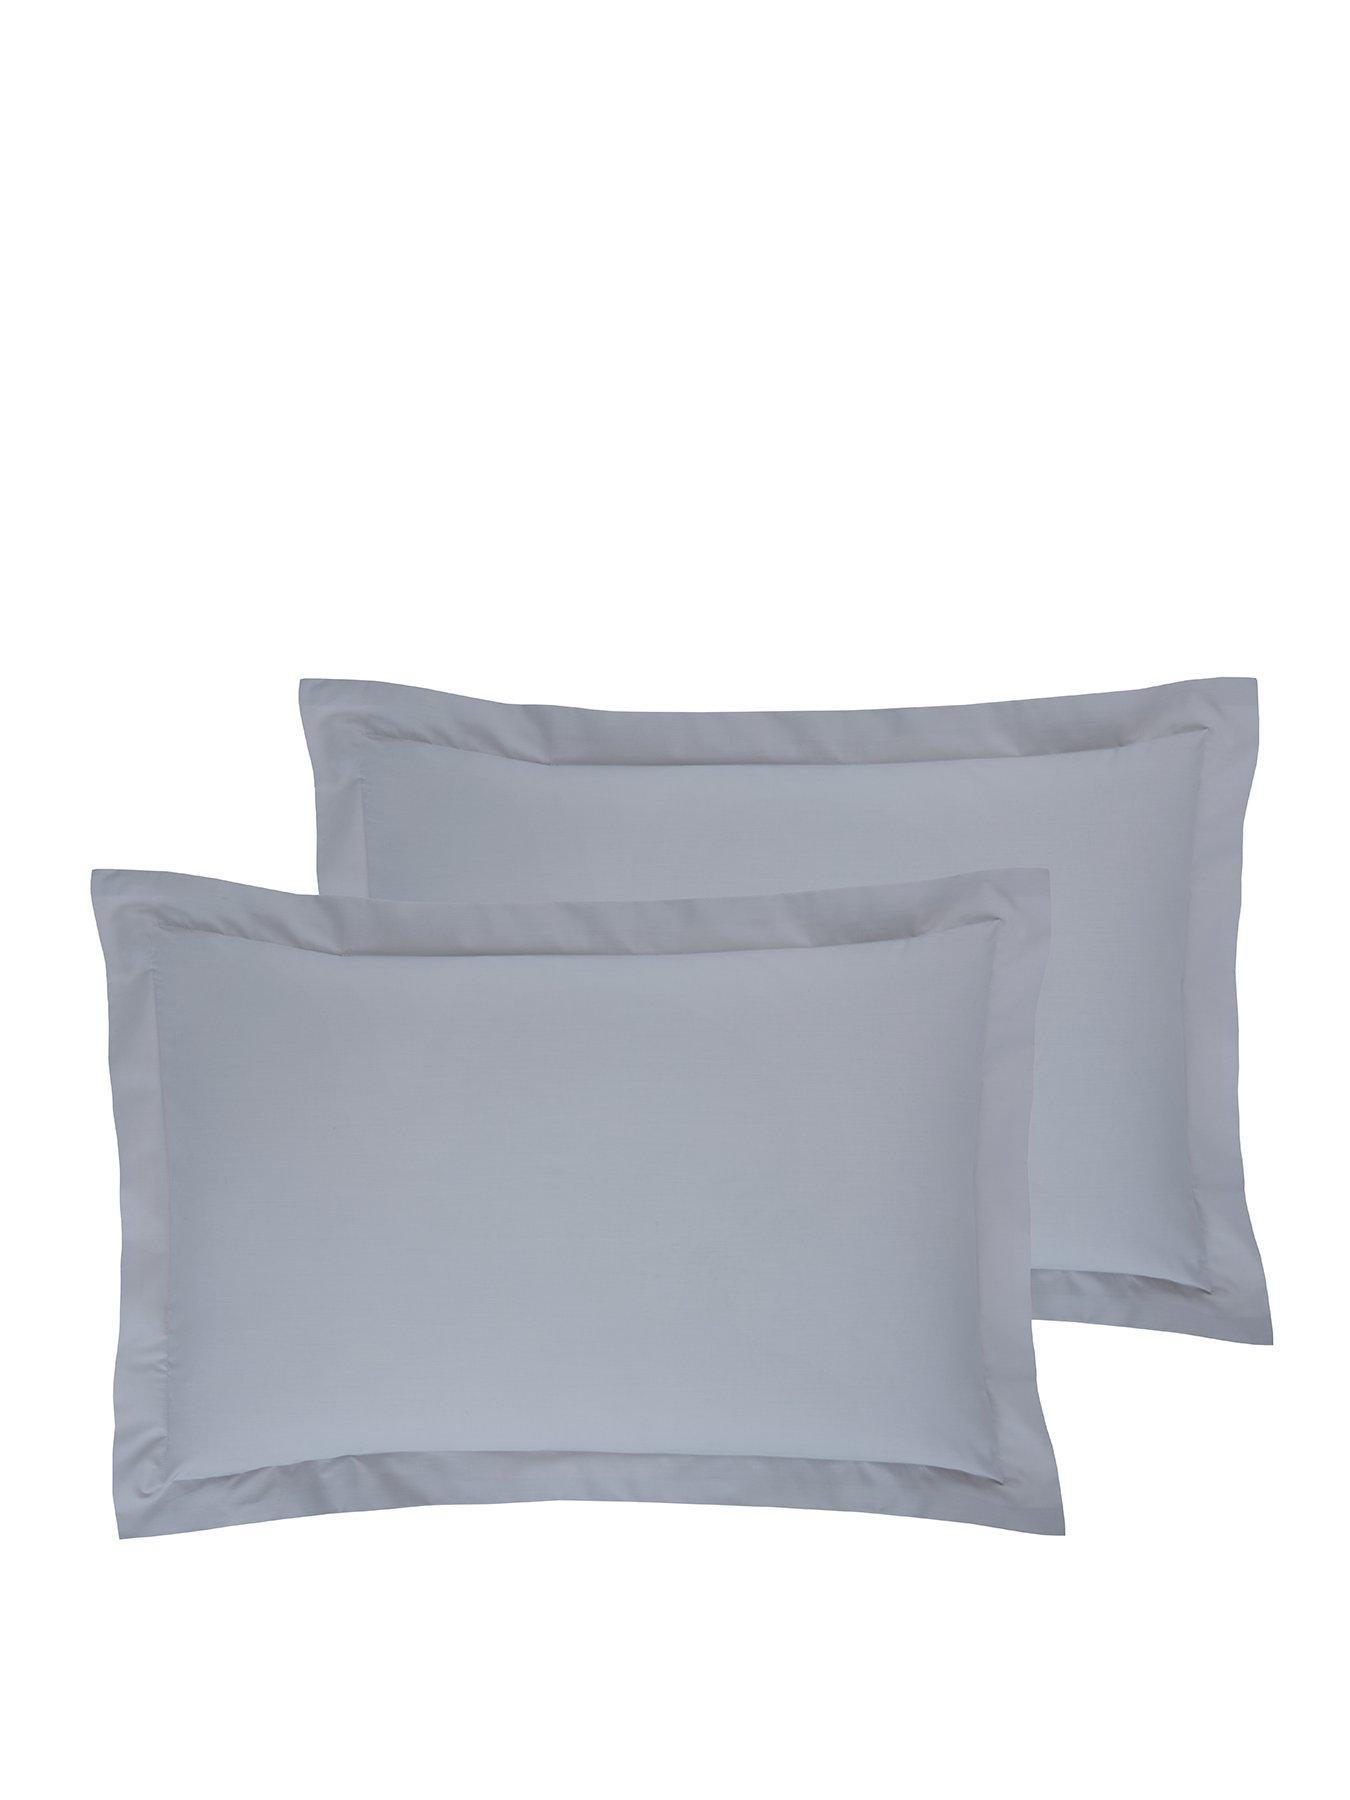 black Everyday Blue Standard Pillowcase